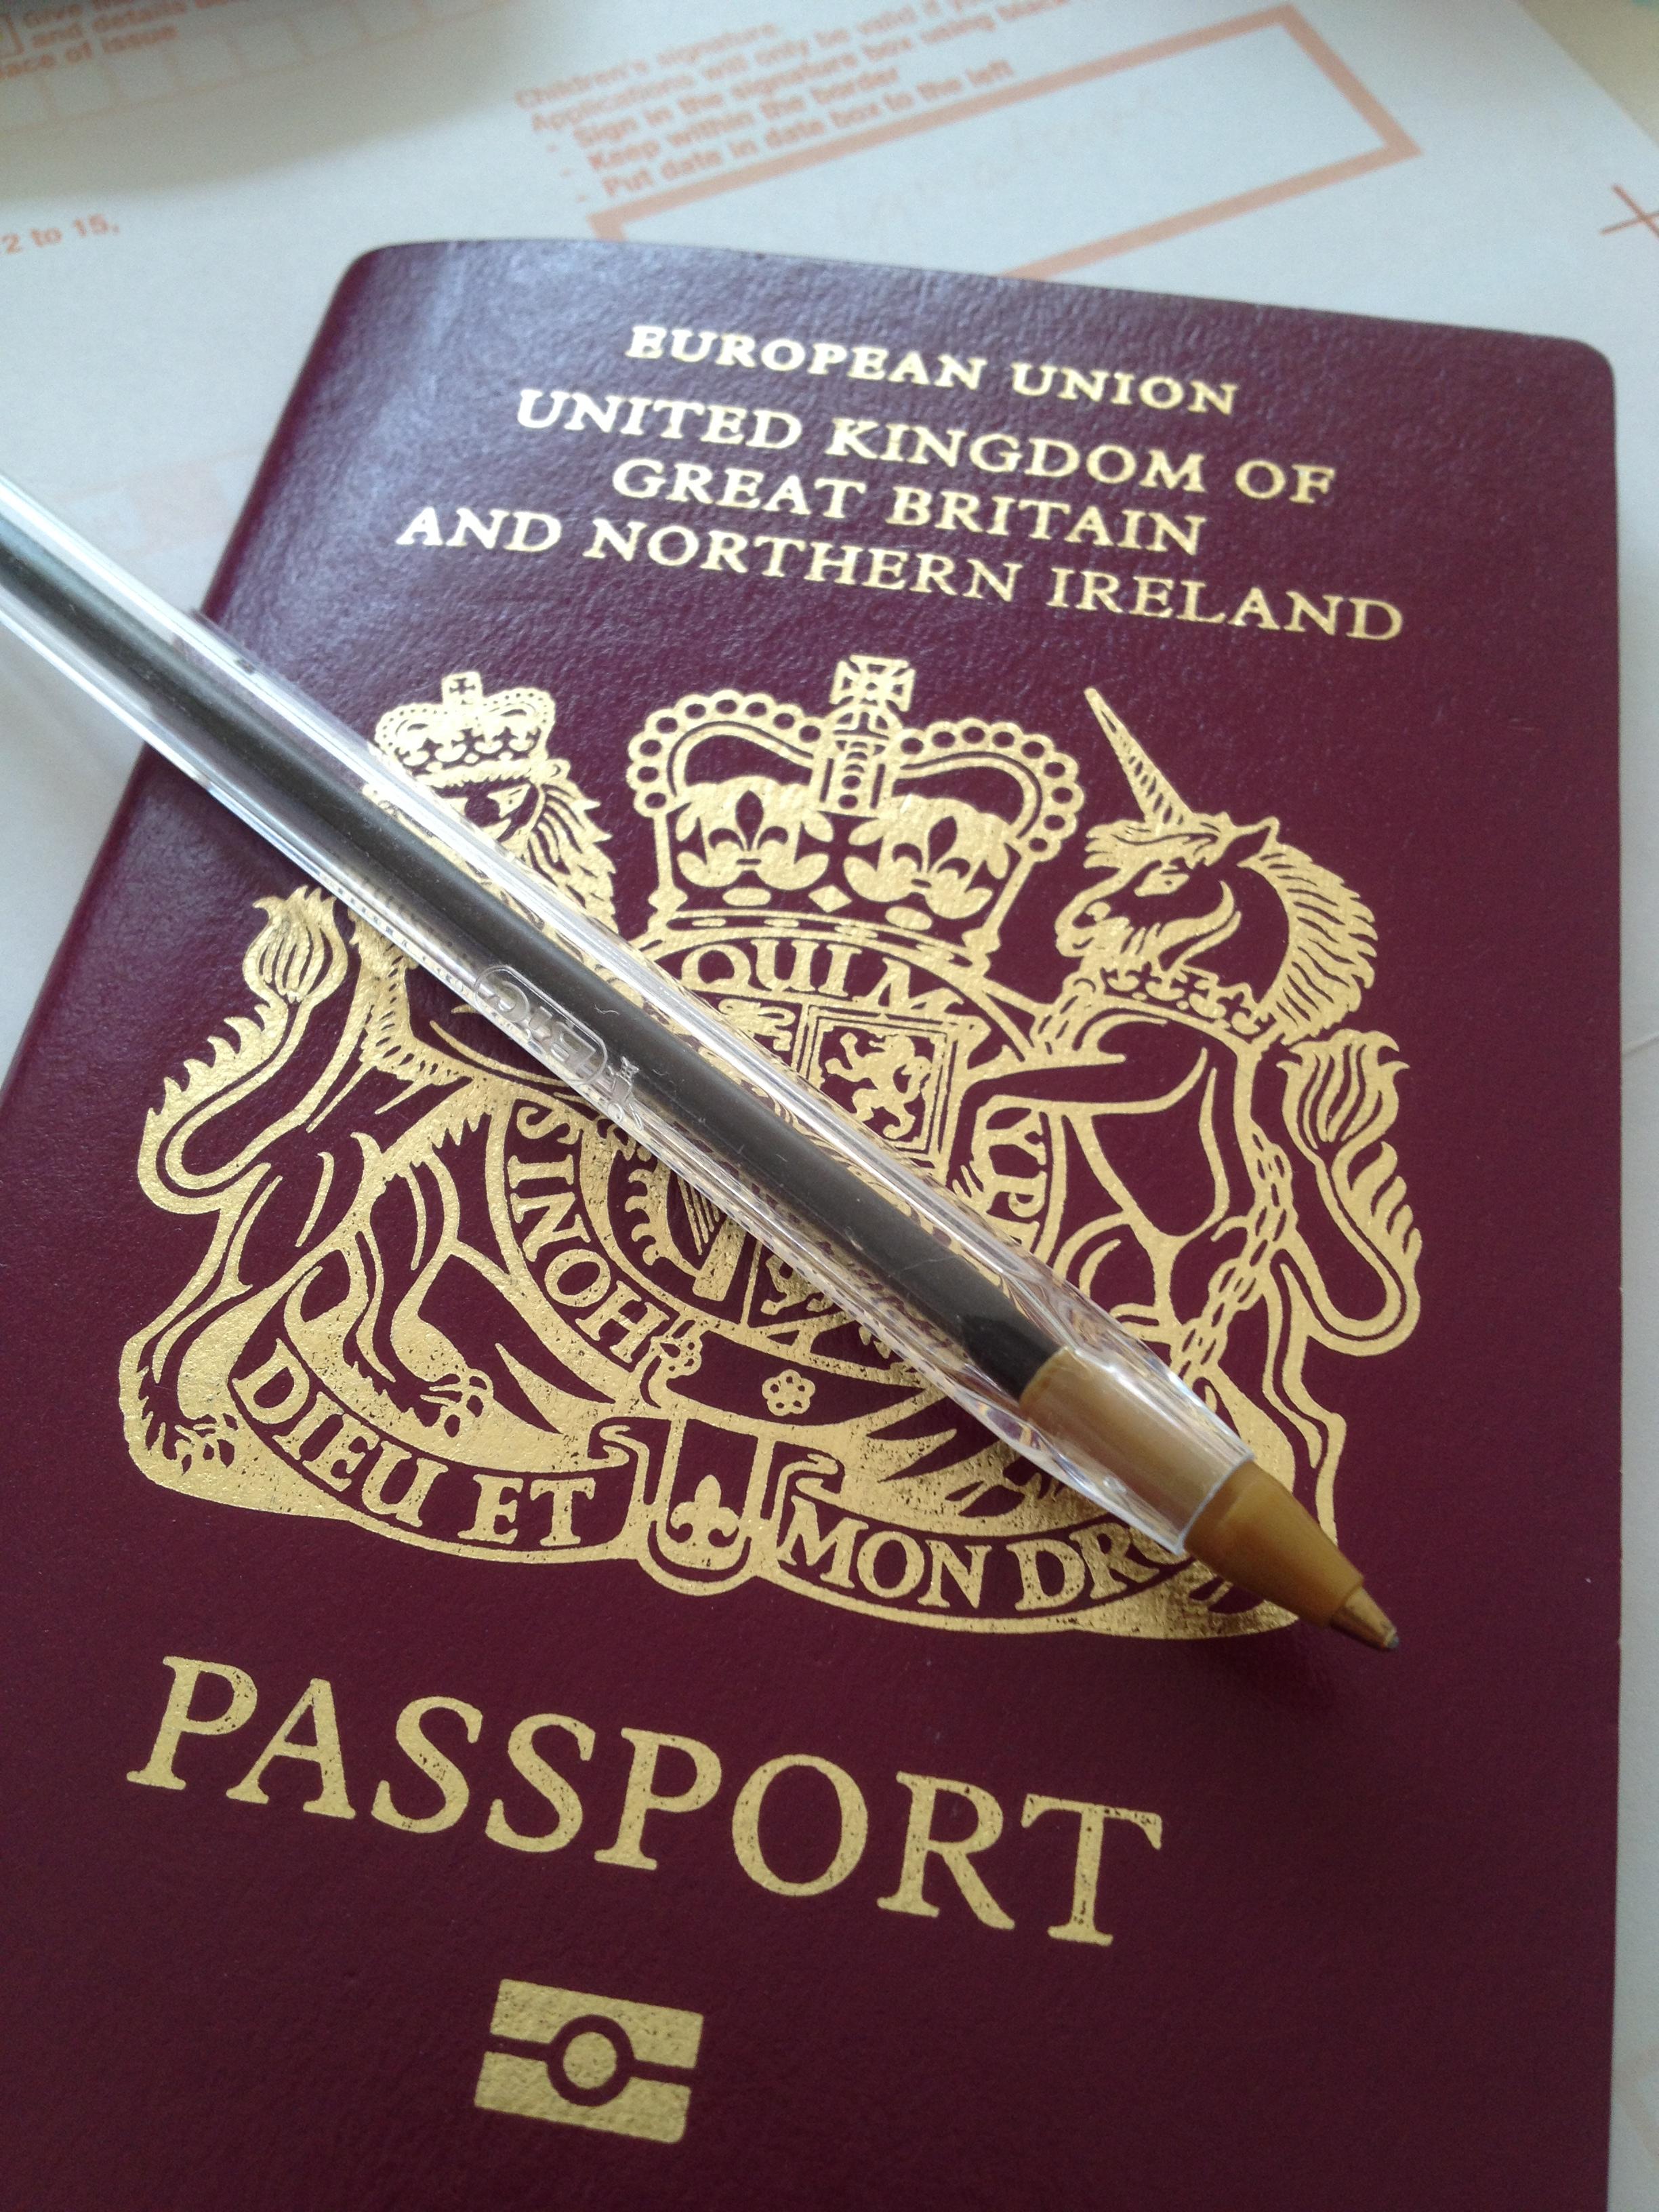 Passport child application form choice image standard form examples childrens uk passport application form familytripfinder toptips passport worth remembering falaconquin falaconquin